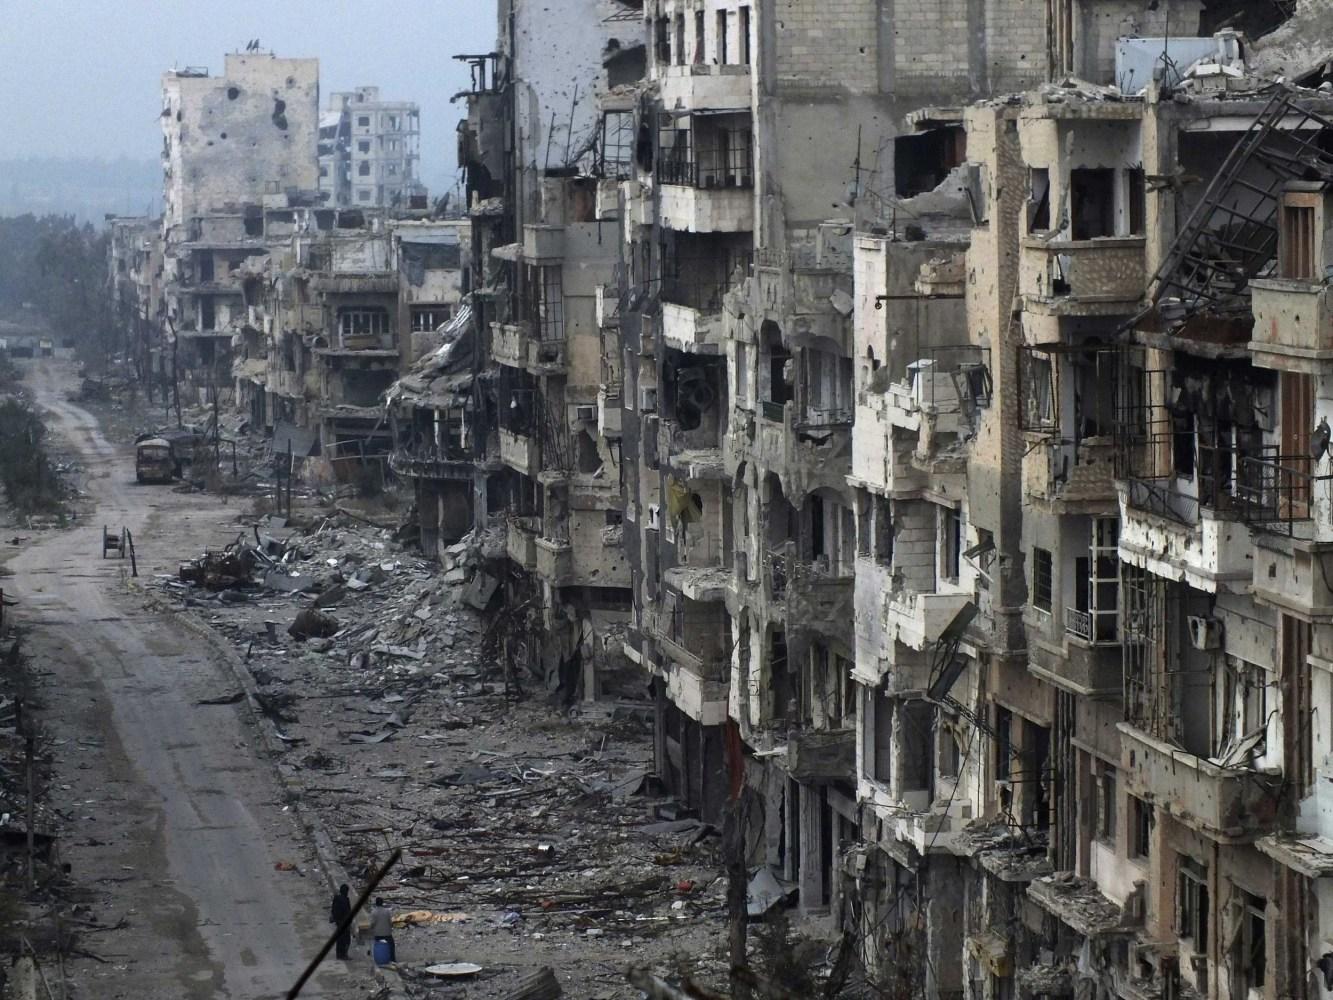 Aid Convoy Stuck Outside Besieged Homs as Syria Talks Stall NBC News